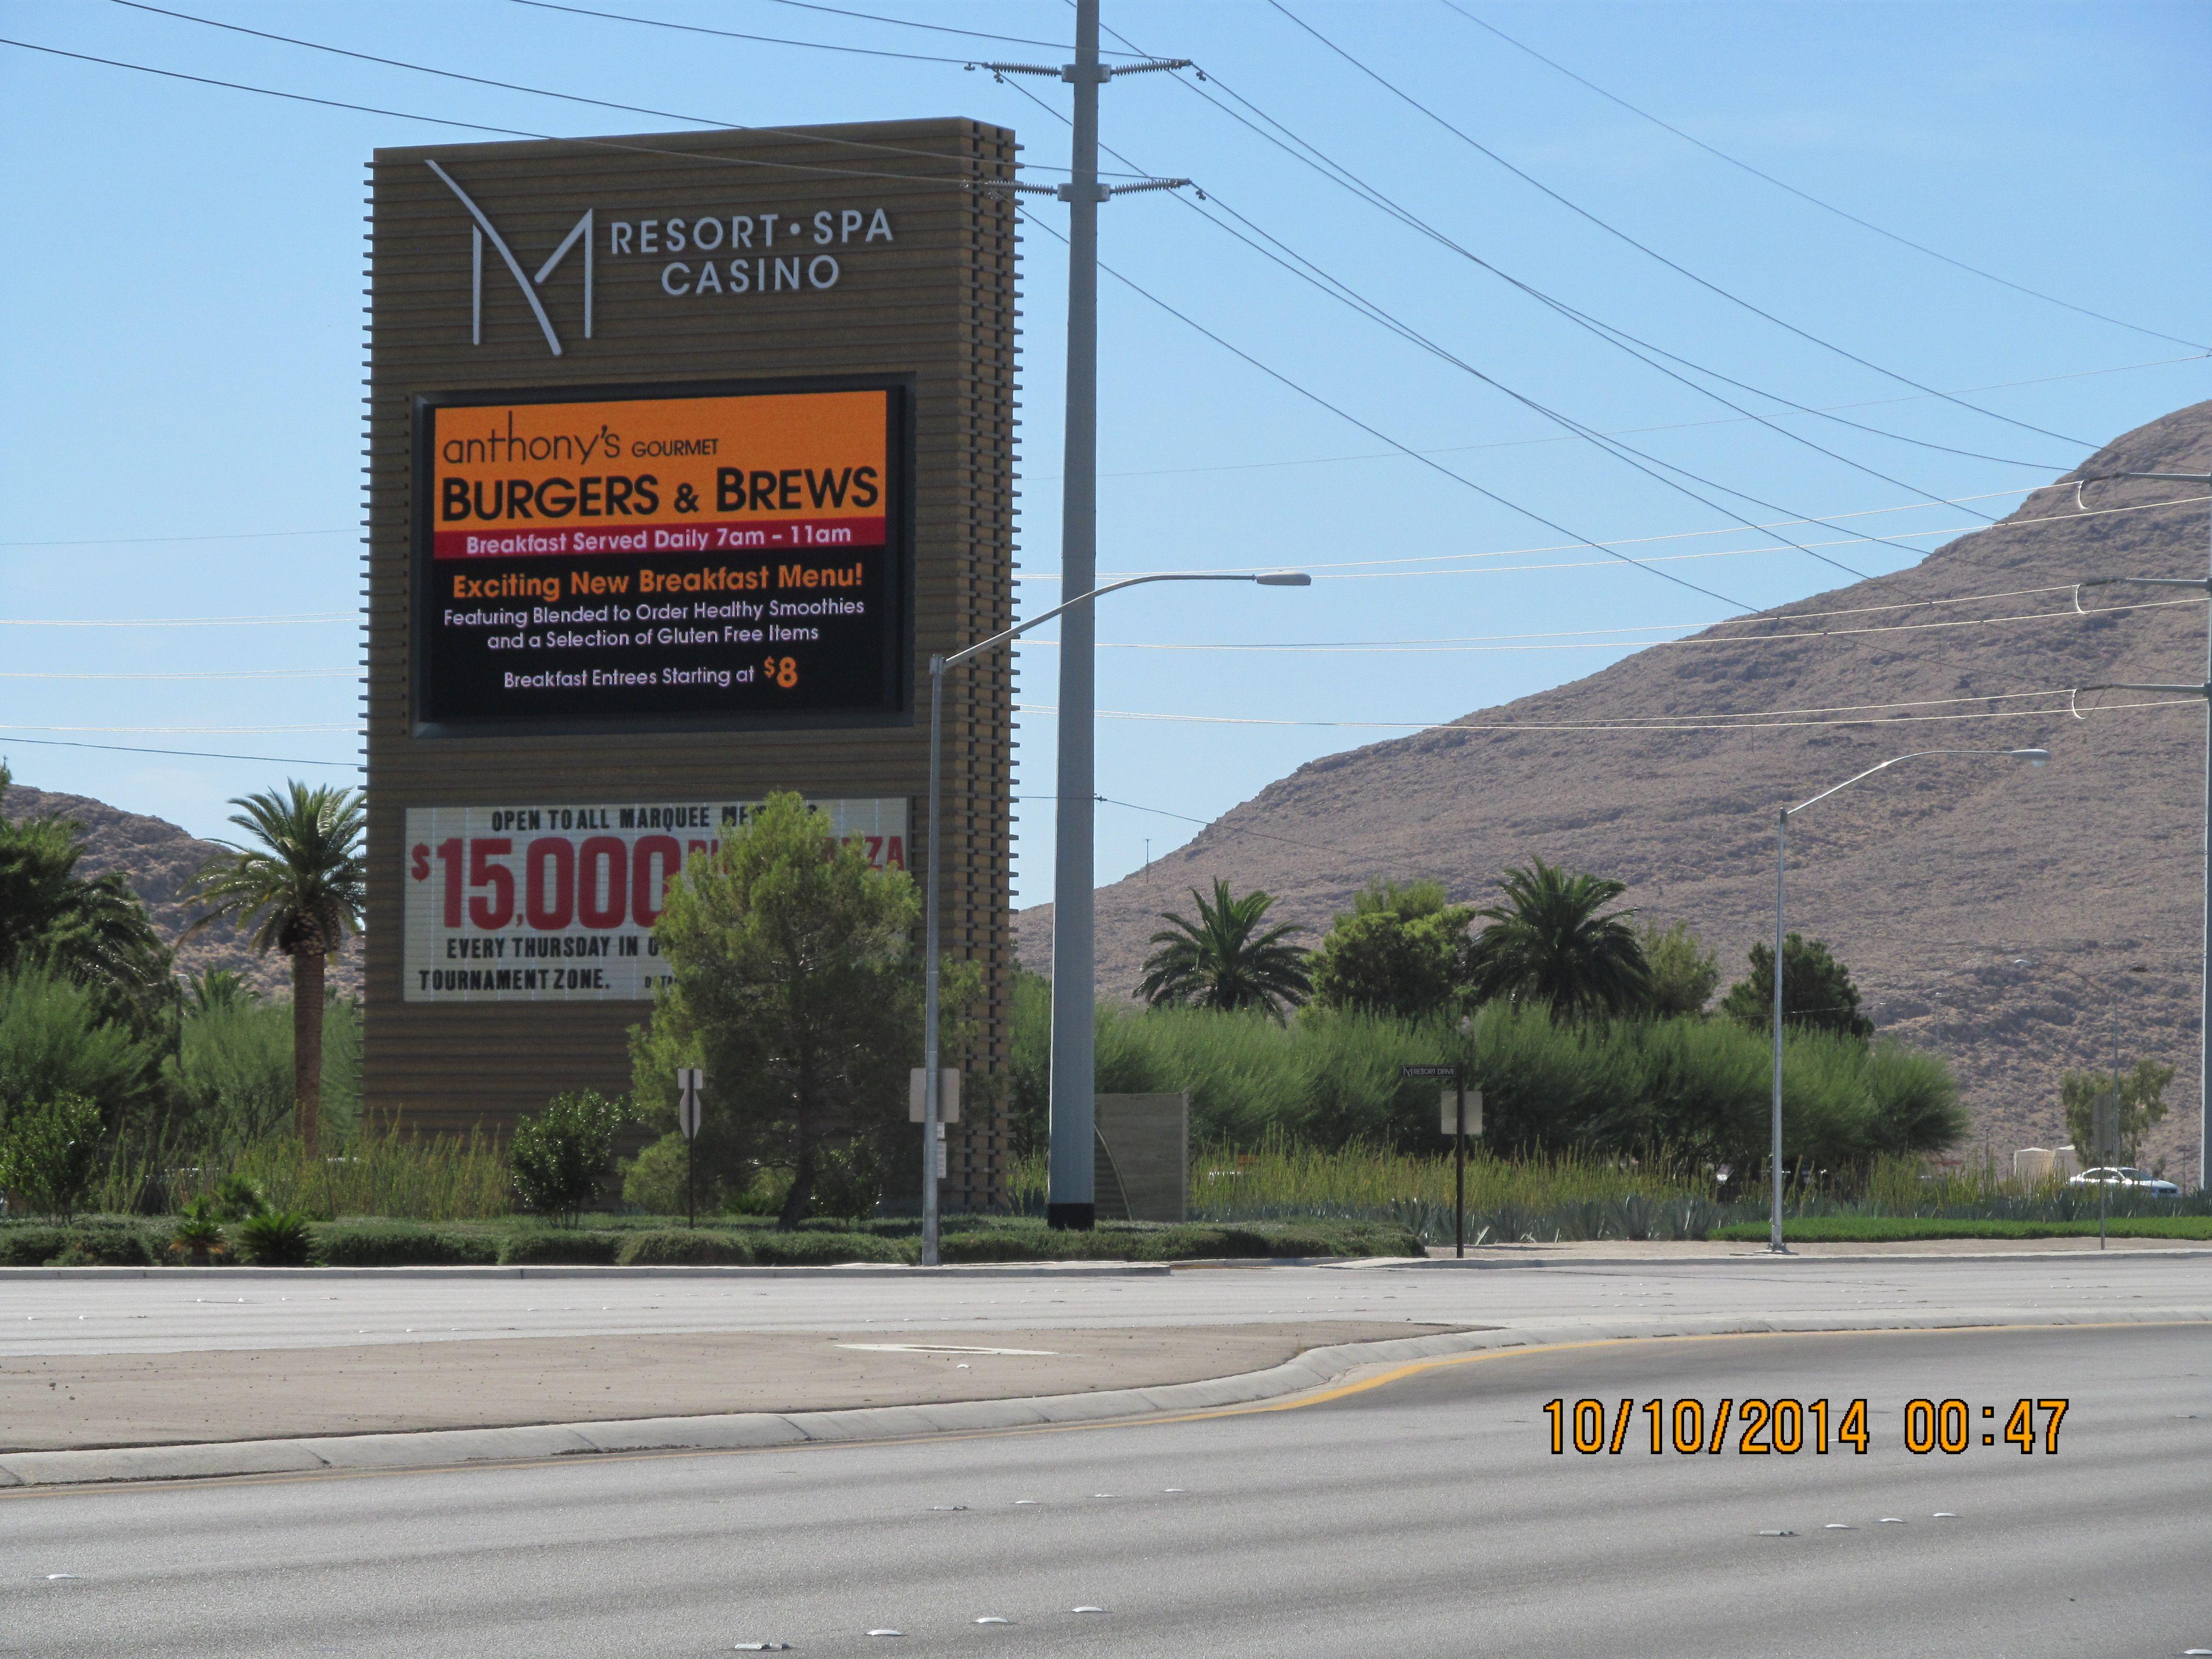 Near Southern Highlands Las Vegas Henderson Nv Hotel M Resort And Spa Southern Highlands Las Vegas Las Vegas Nevada Henderson Nv